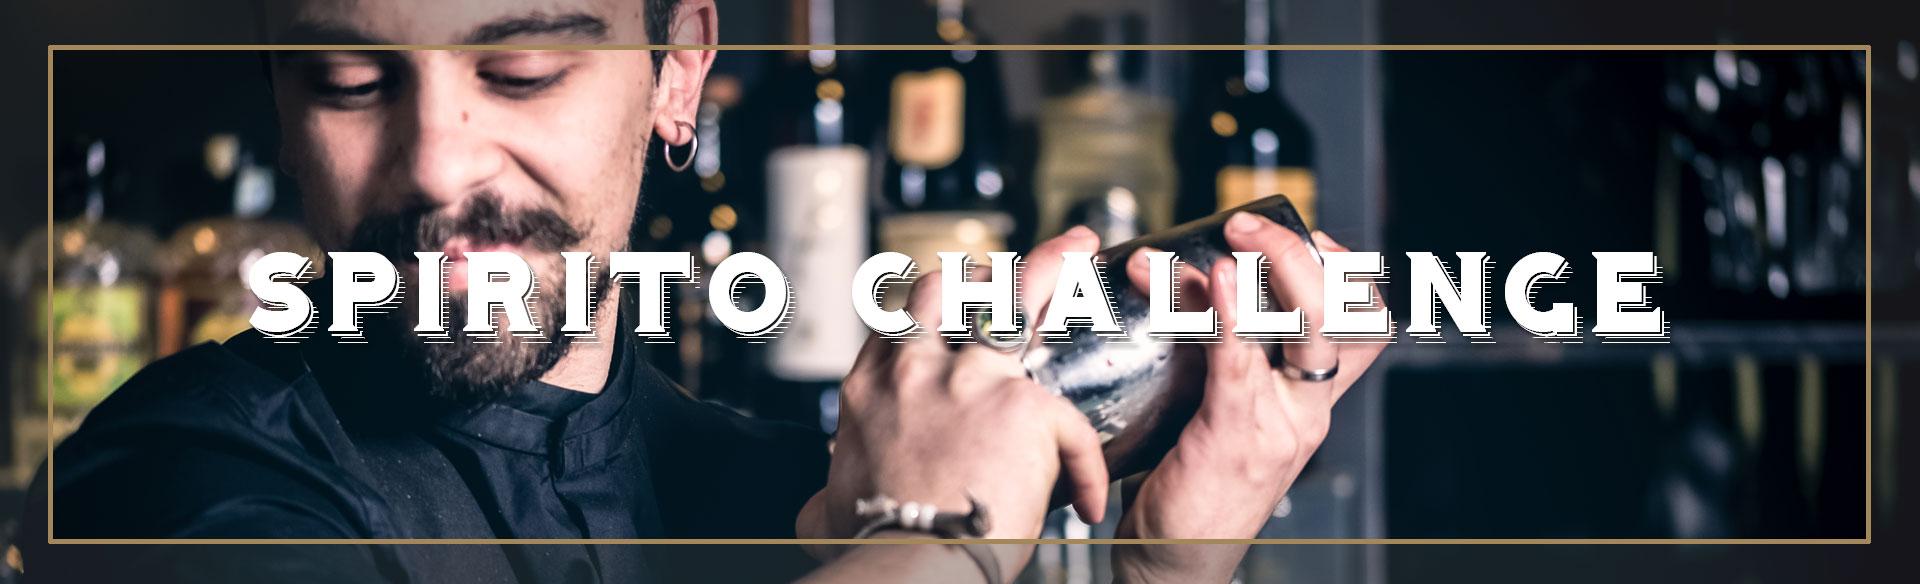 banner-challenge-spirito